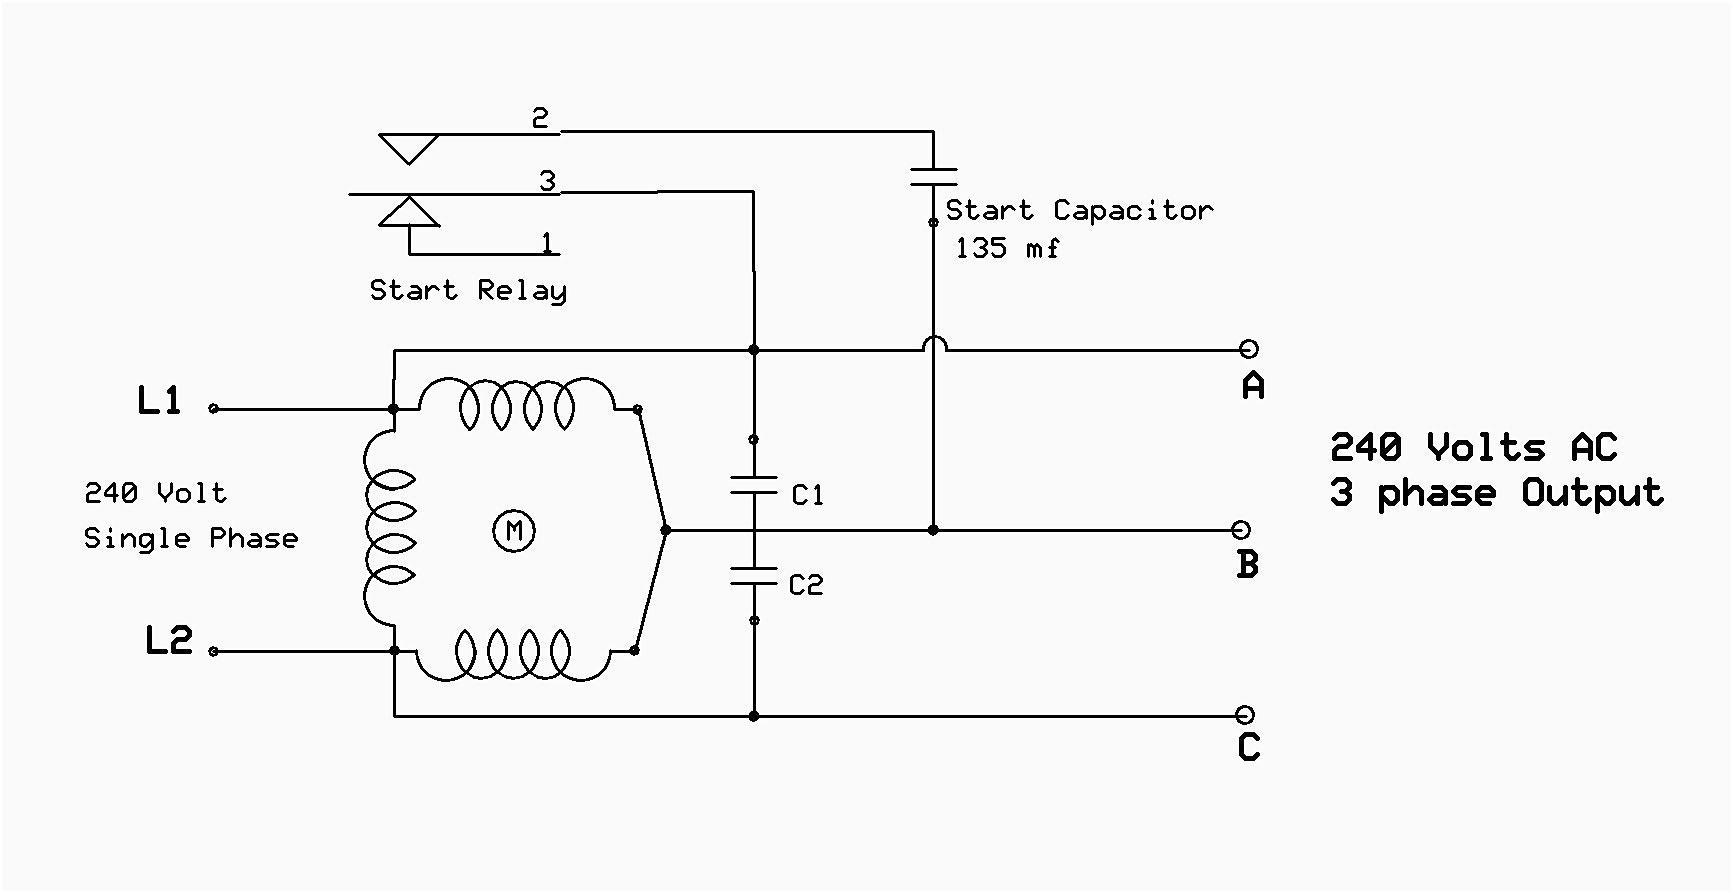 hight resolution of wiring diagram single phase motor 6 lead wiring library 6 lead single phase motor wiring diagram